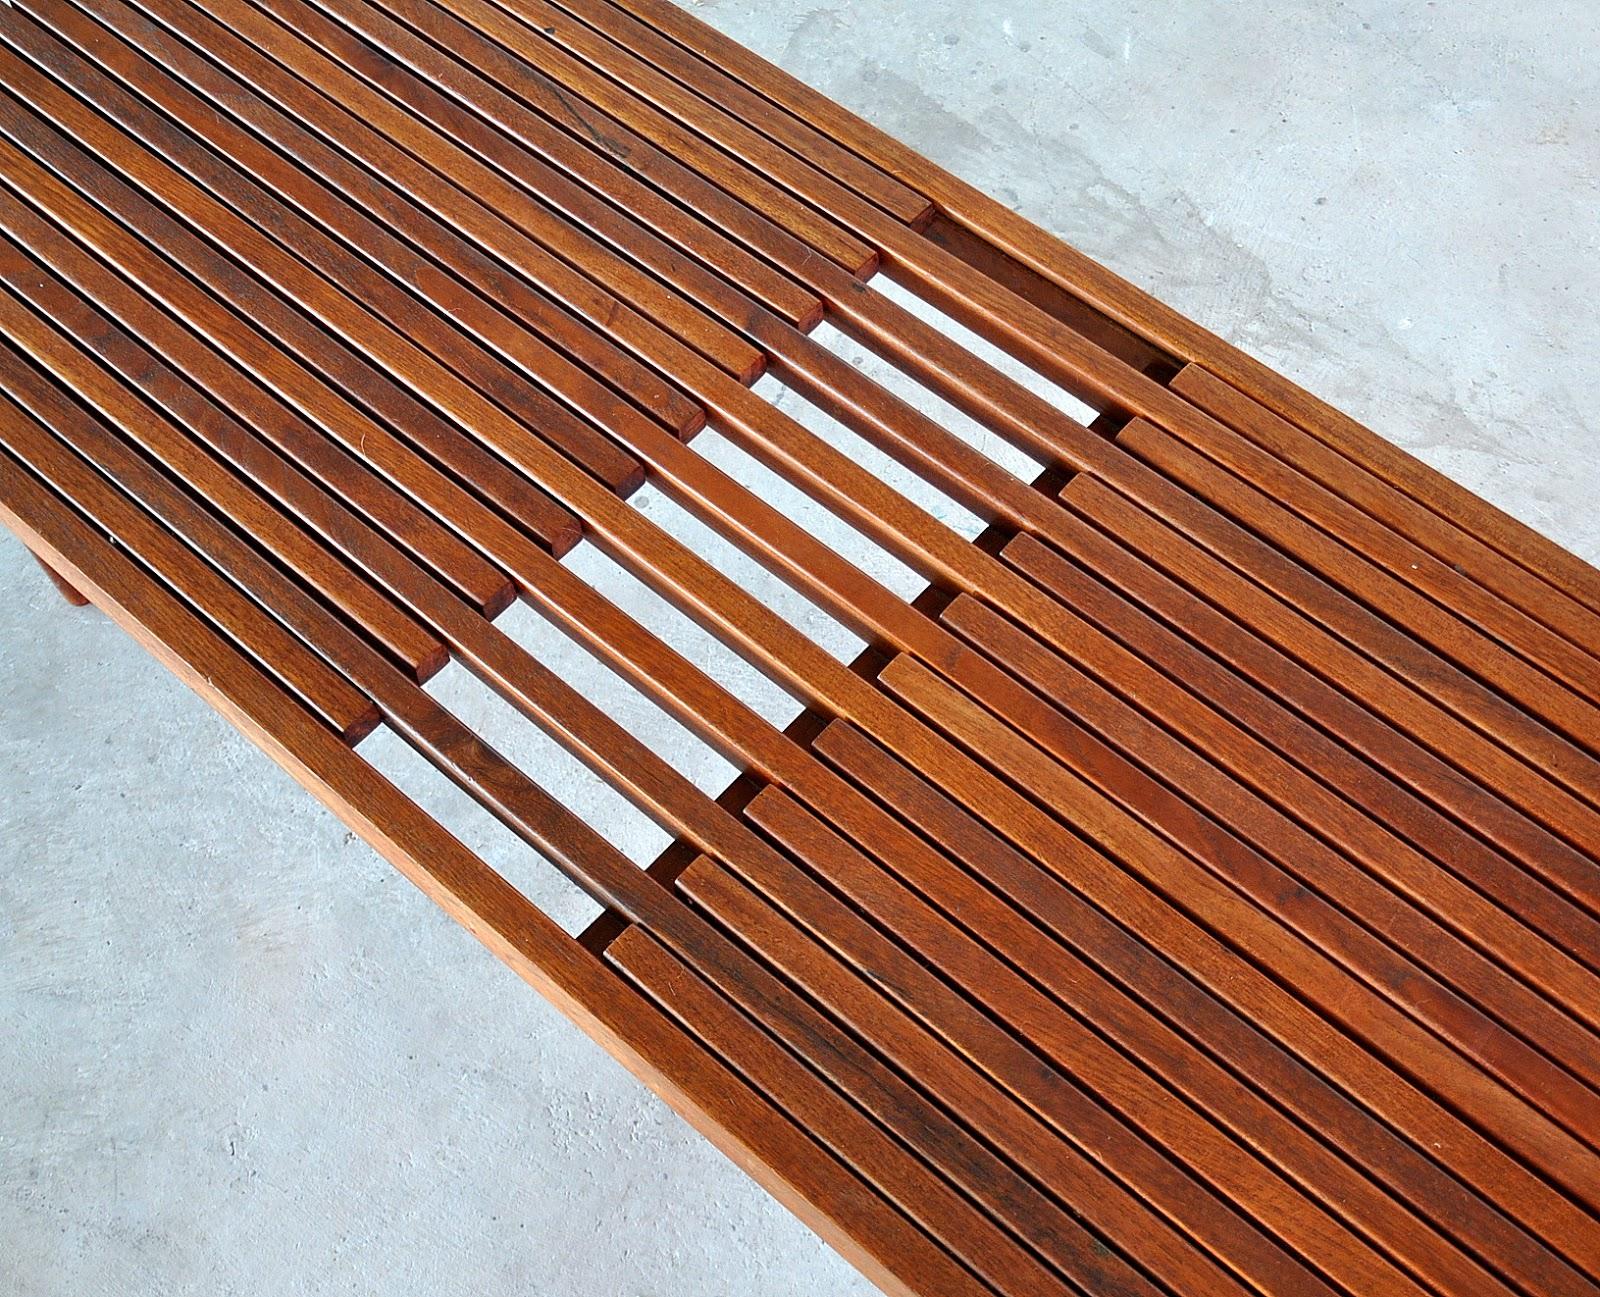 danish modern sofa bed grey sleeper select modern: brown saltman expandable teak slat bench or ...